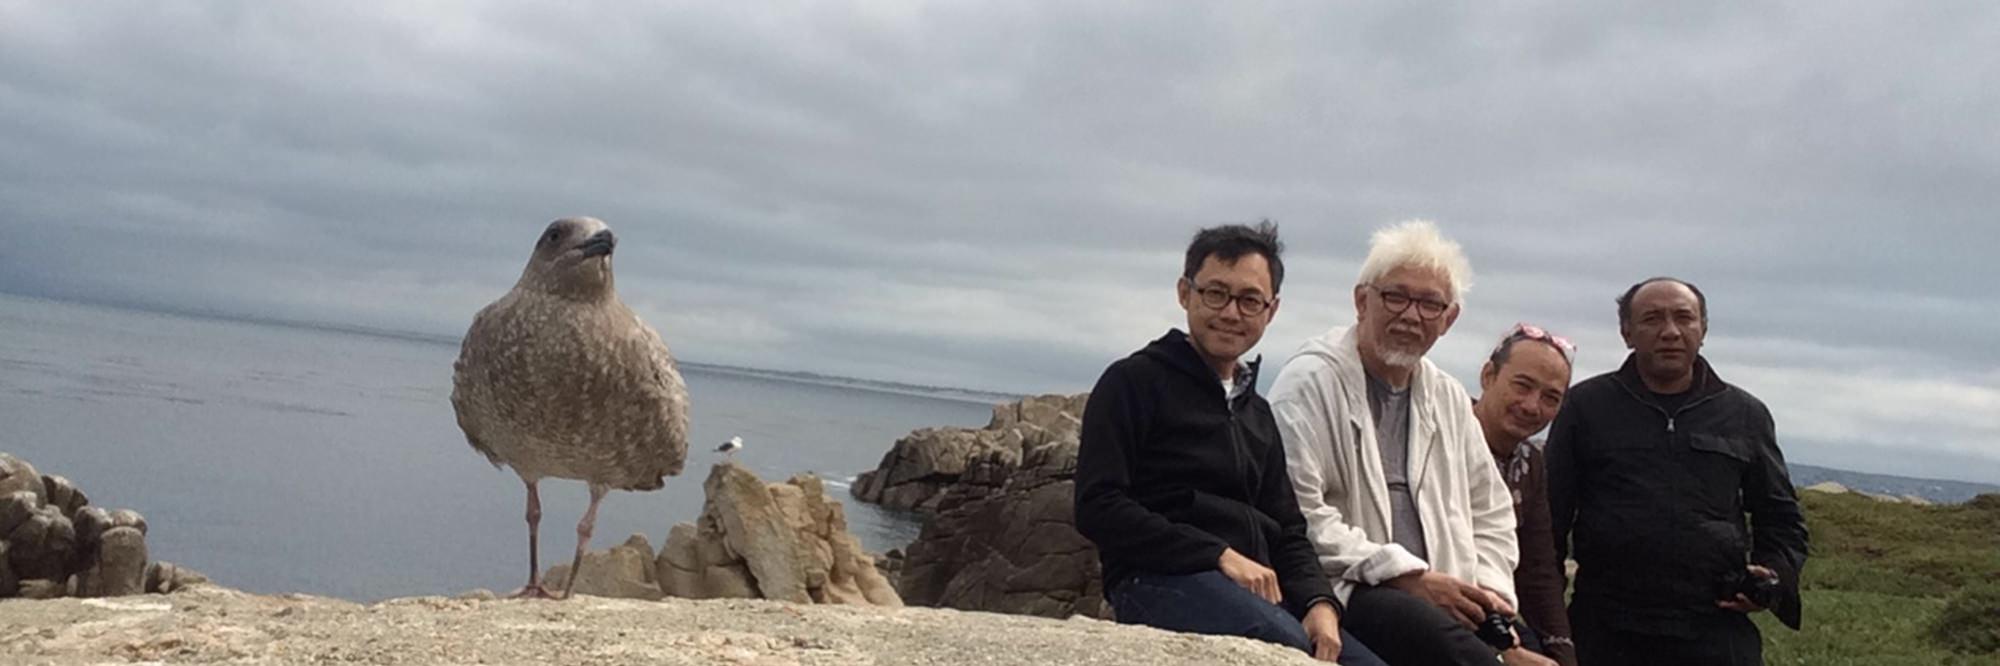 ROAD TRIP TO CALIFORNIA 2015   | Ahmad Zakii Anwar, Heri Dono, Kow Leong Kiang, Putu Sutawijaya | Sep 22, 2015 |  press release